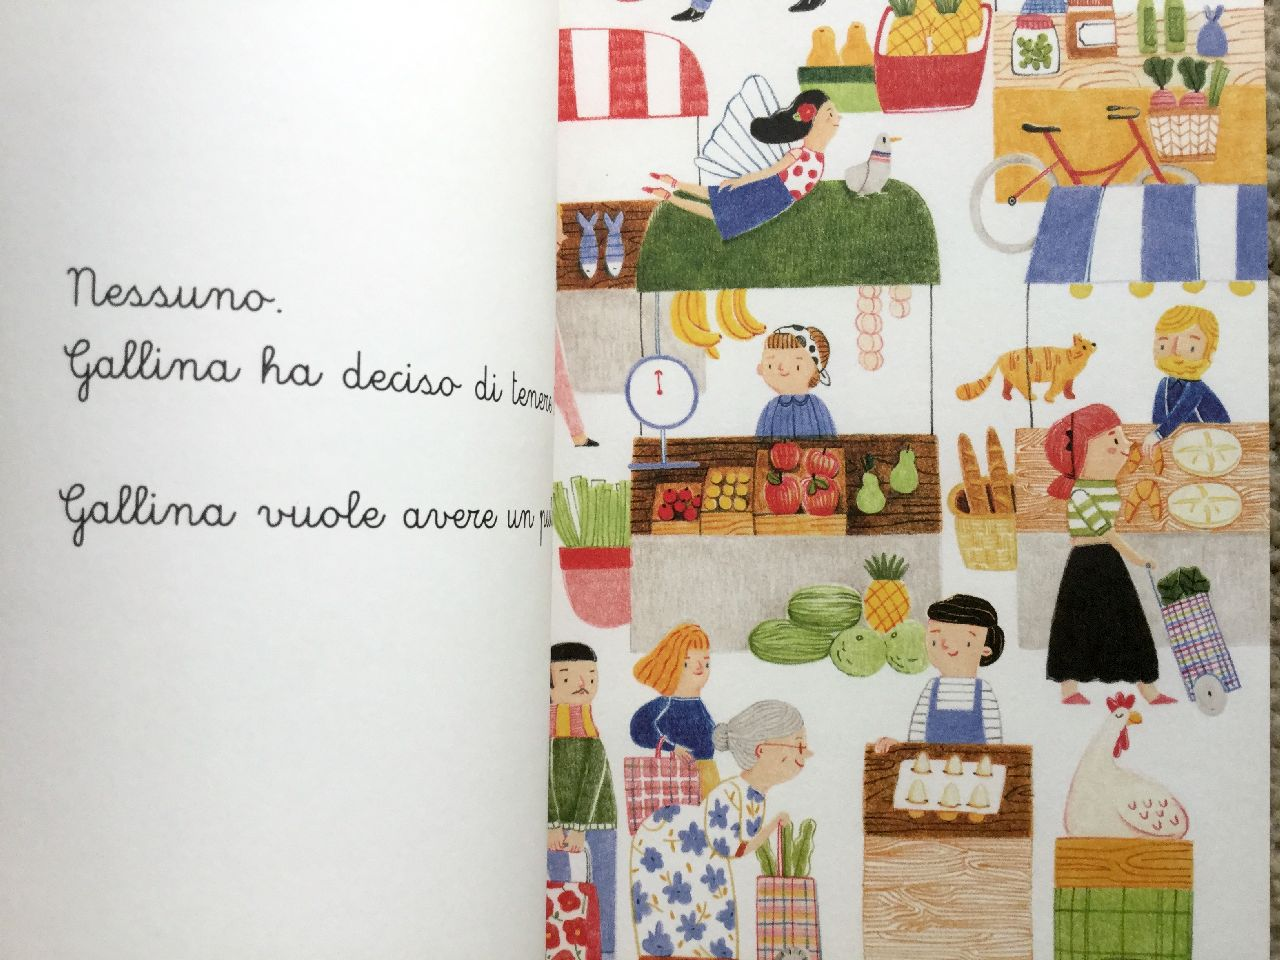 Amanda Mai – Ana Sanfelippo, Serafino e Gallina, Marameo